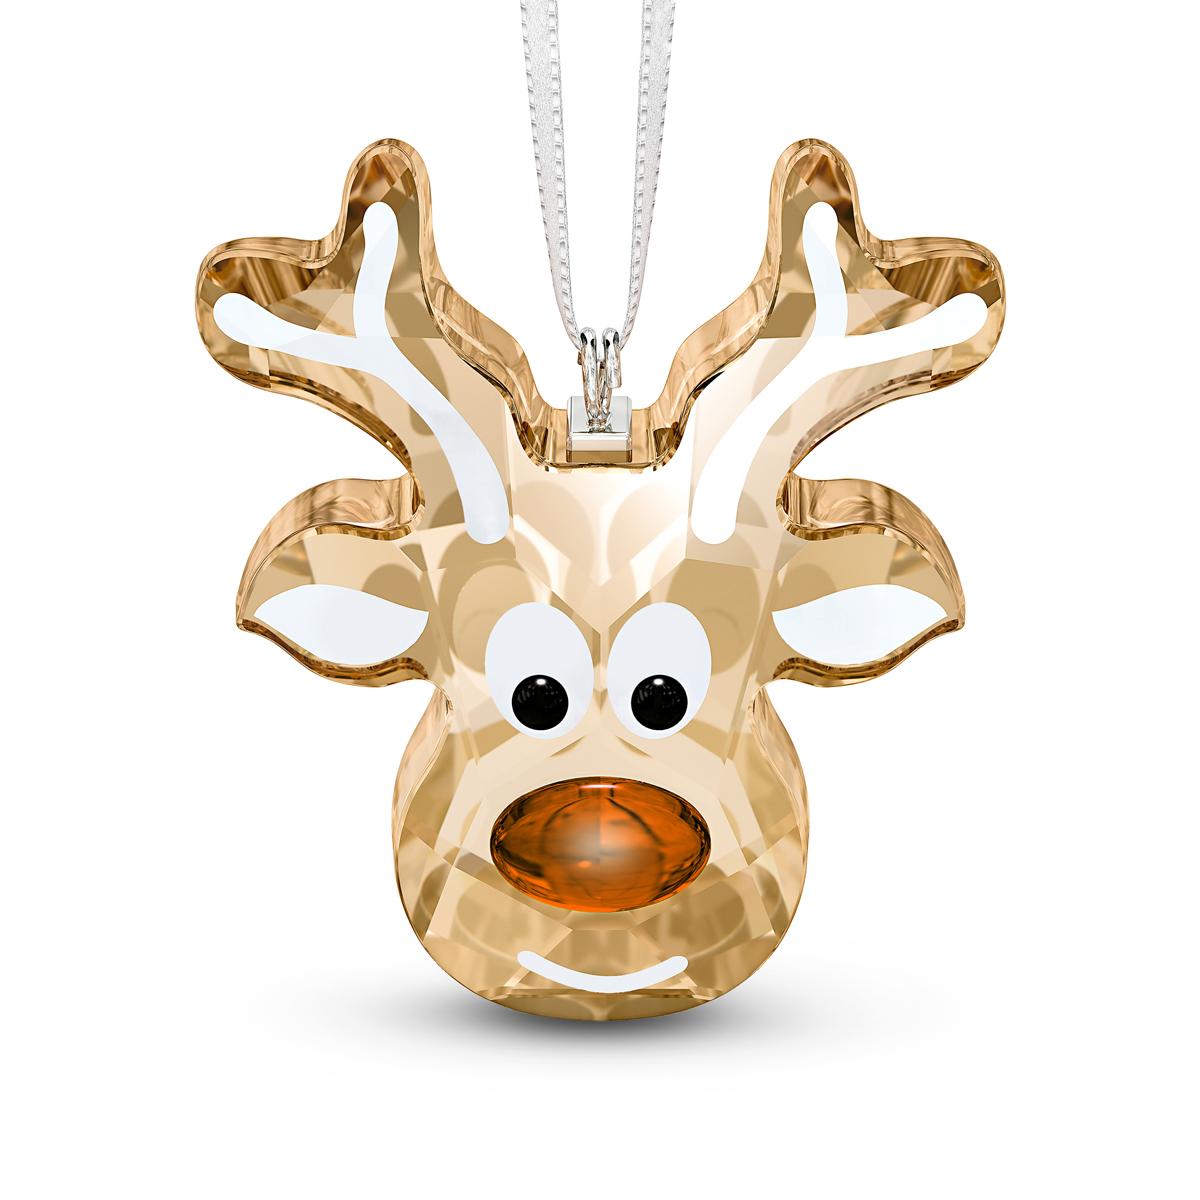 Swarovski Gingerbread Reindeer Ornament